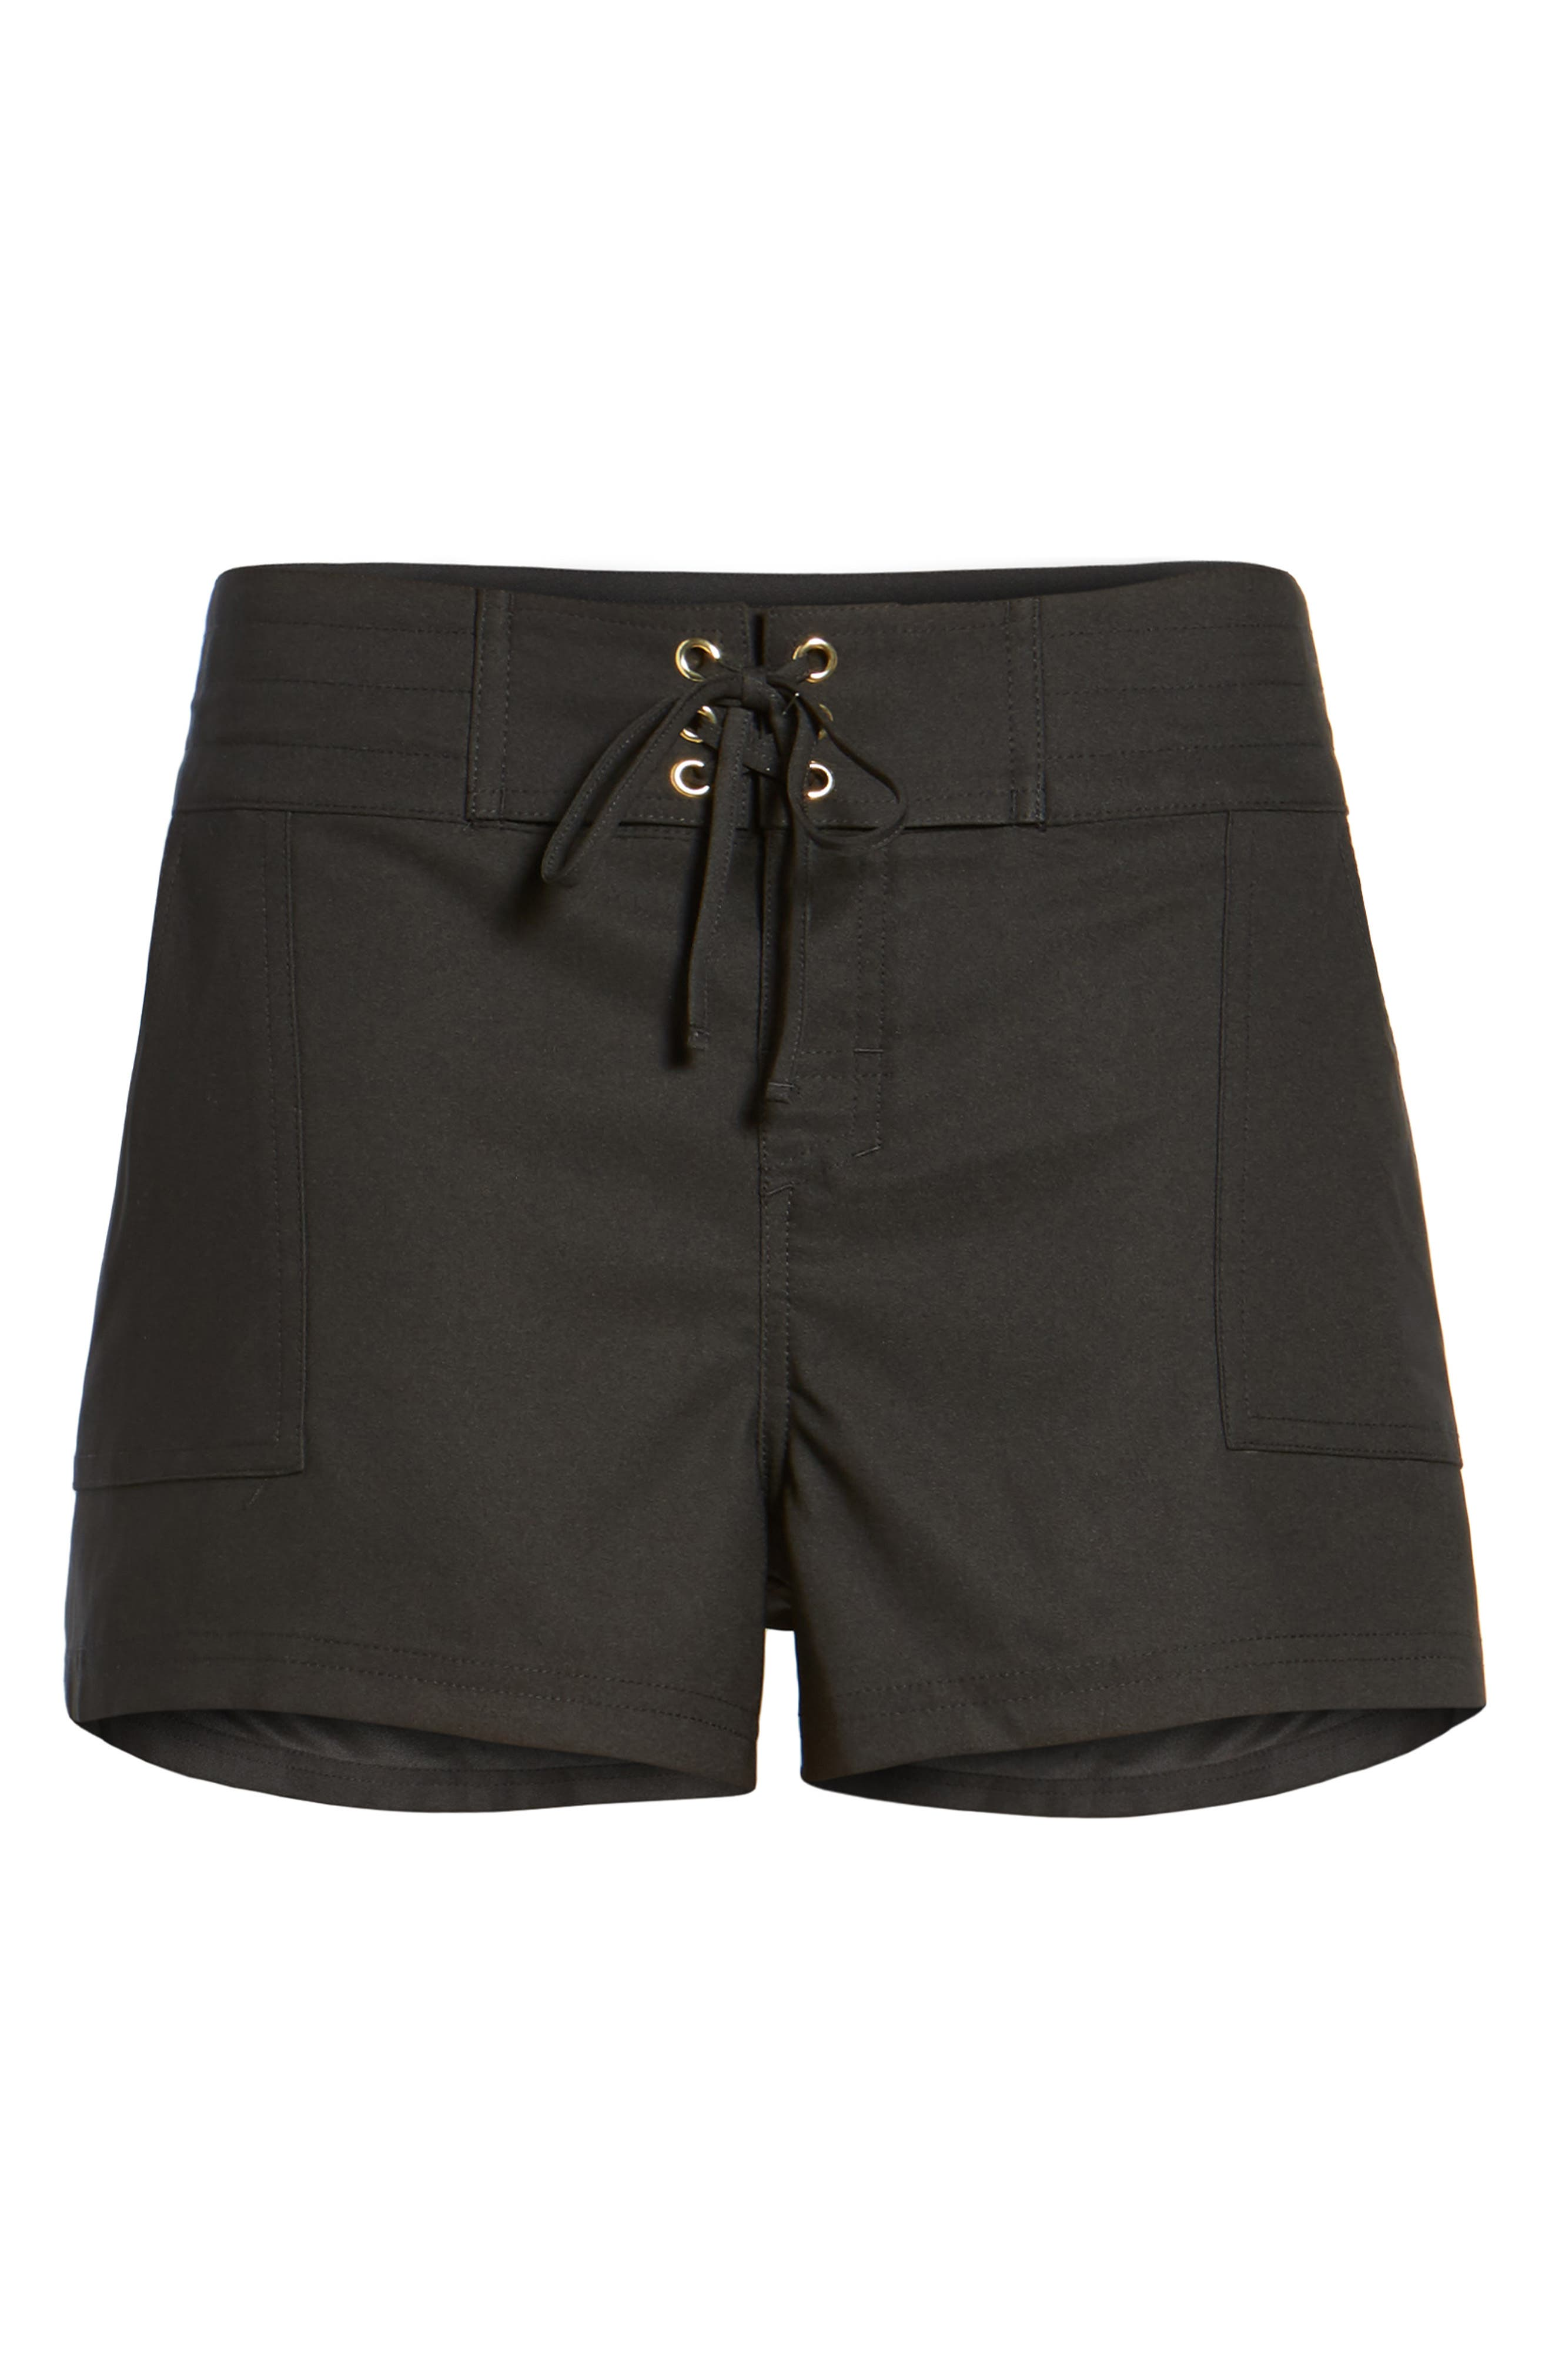 'Boardwalk' Shorts,                             Alternate thumbnail 4, color,                             Black